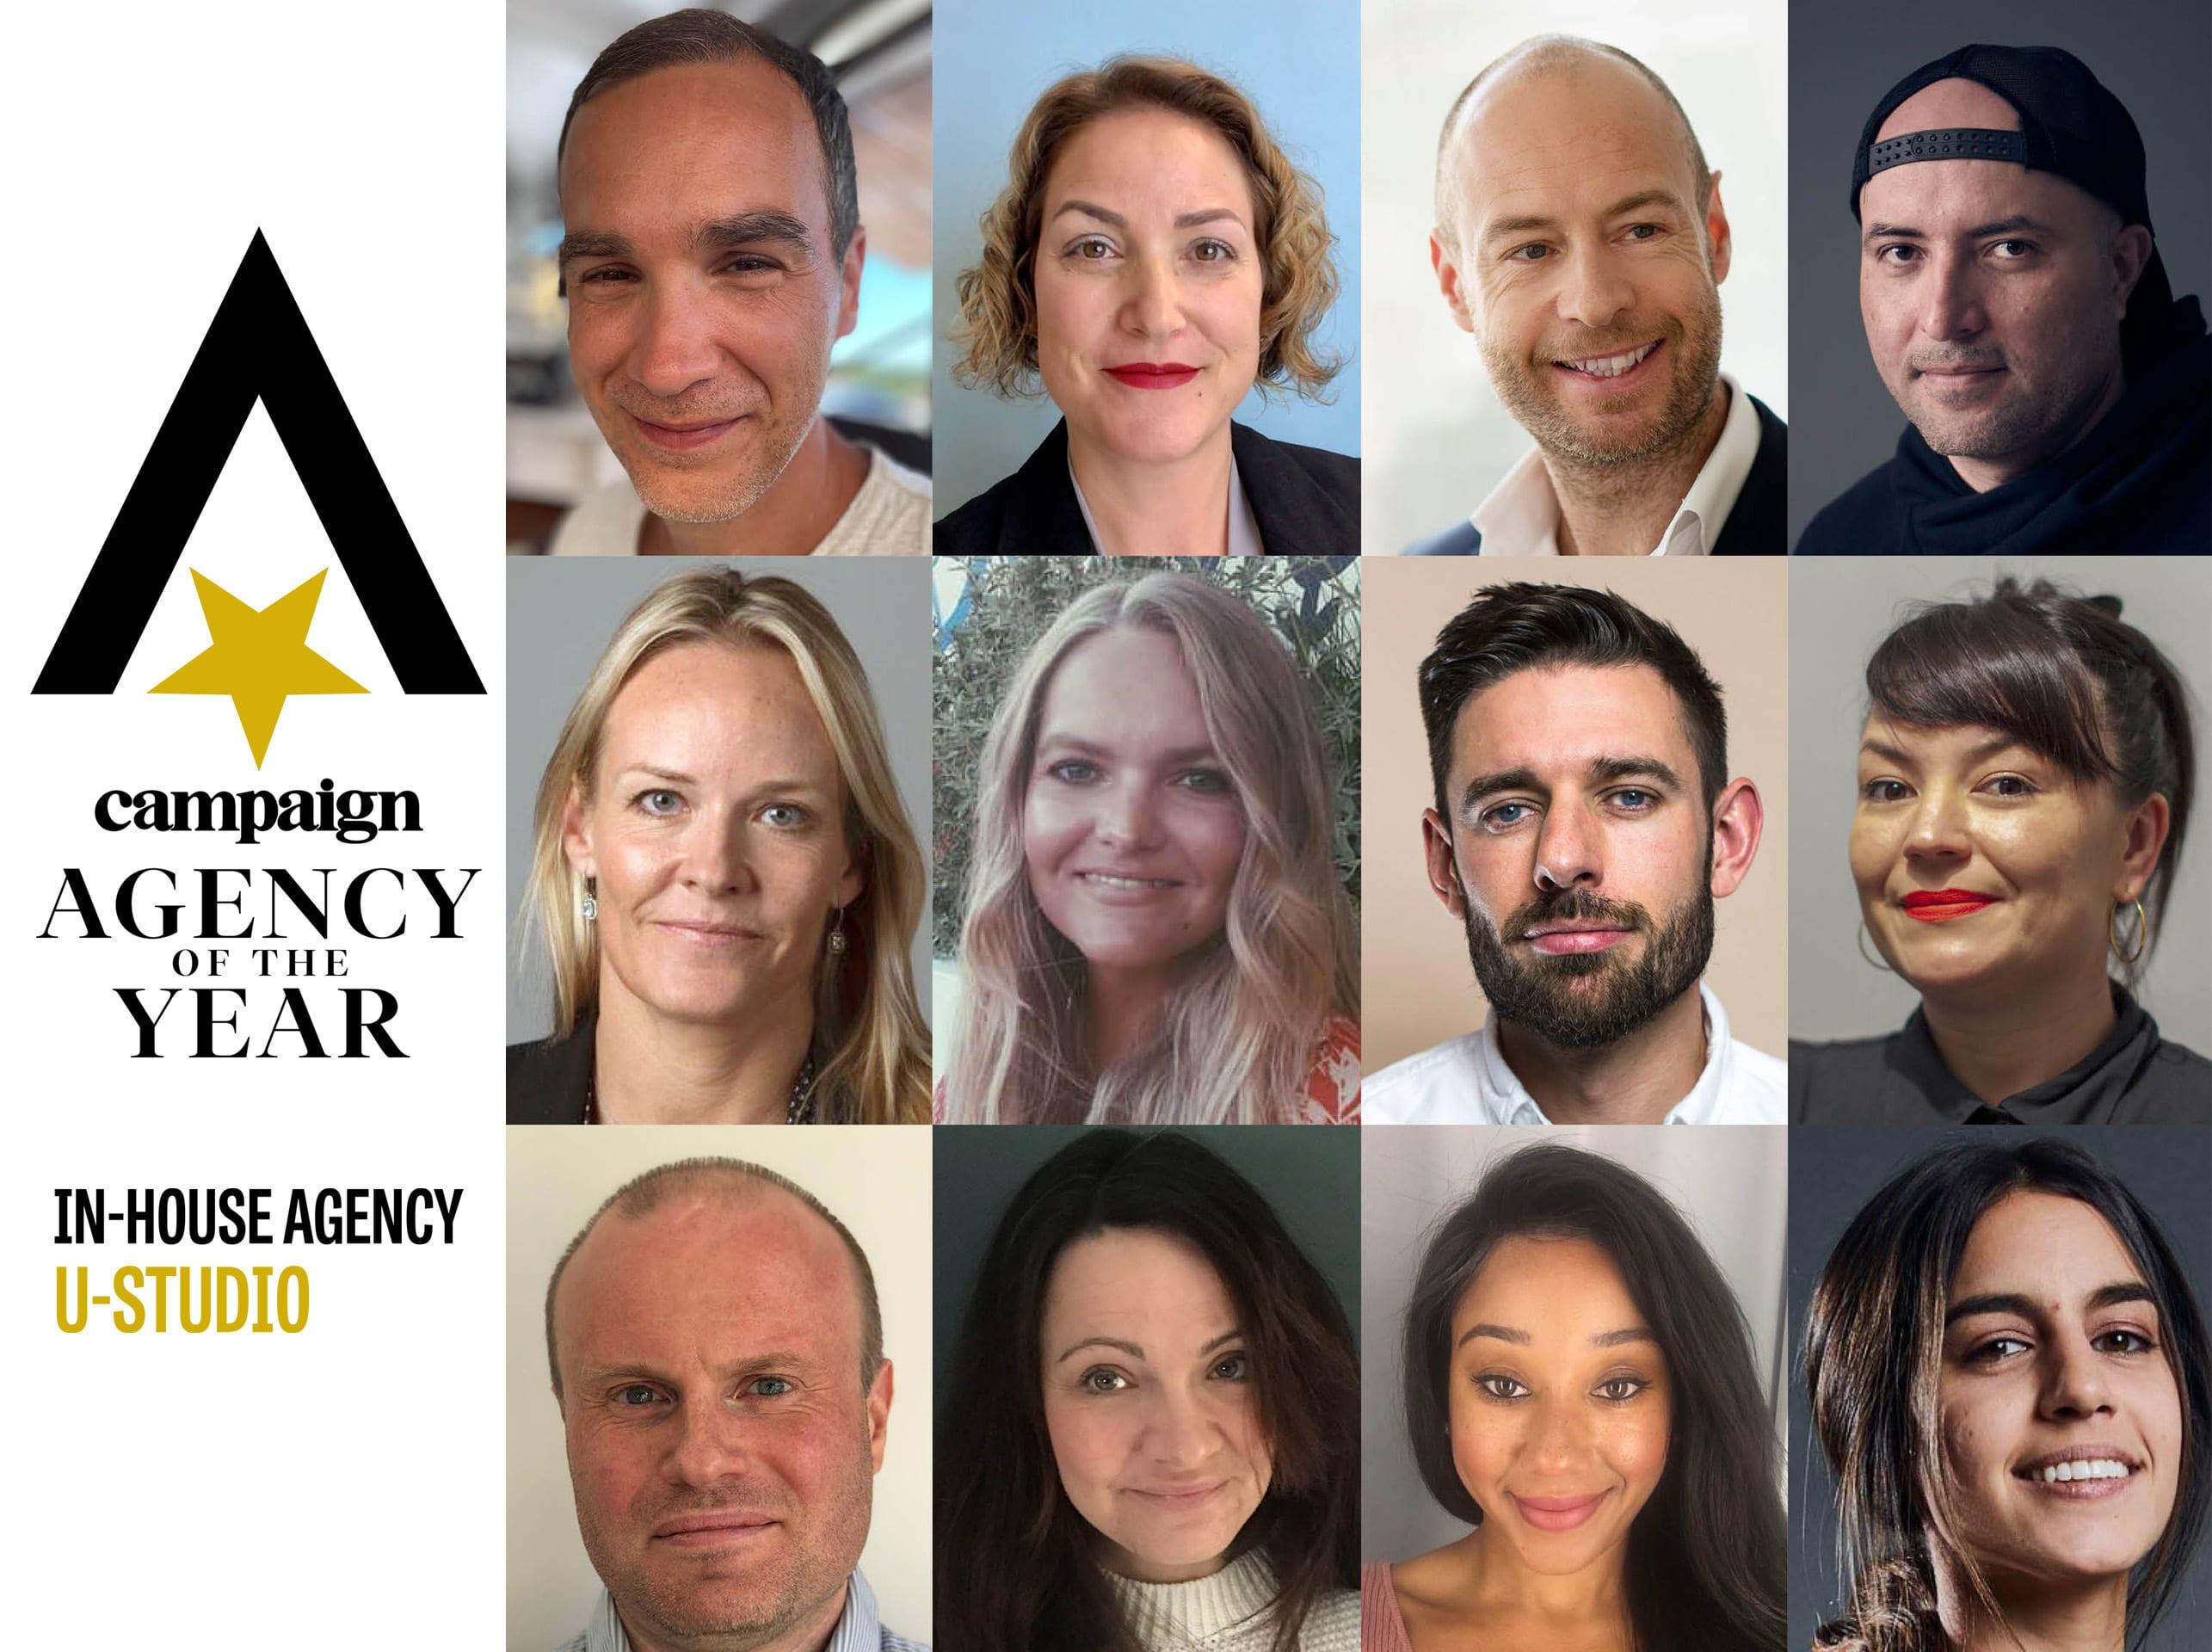 U-Studio agency of the year